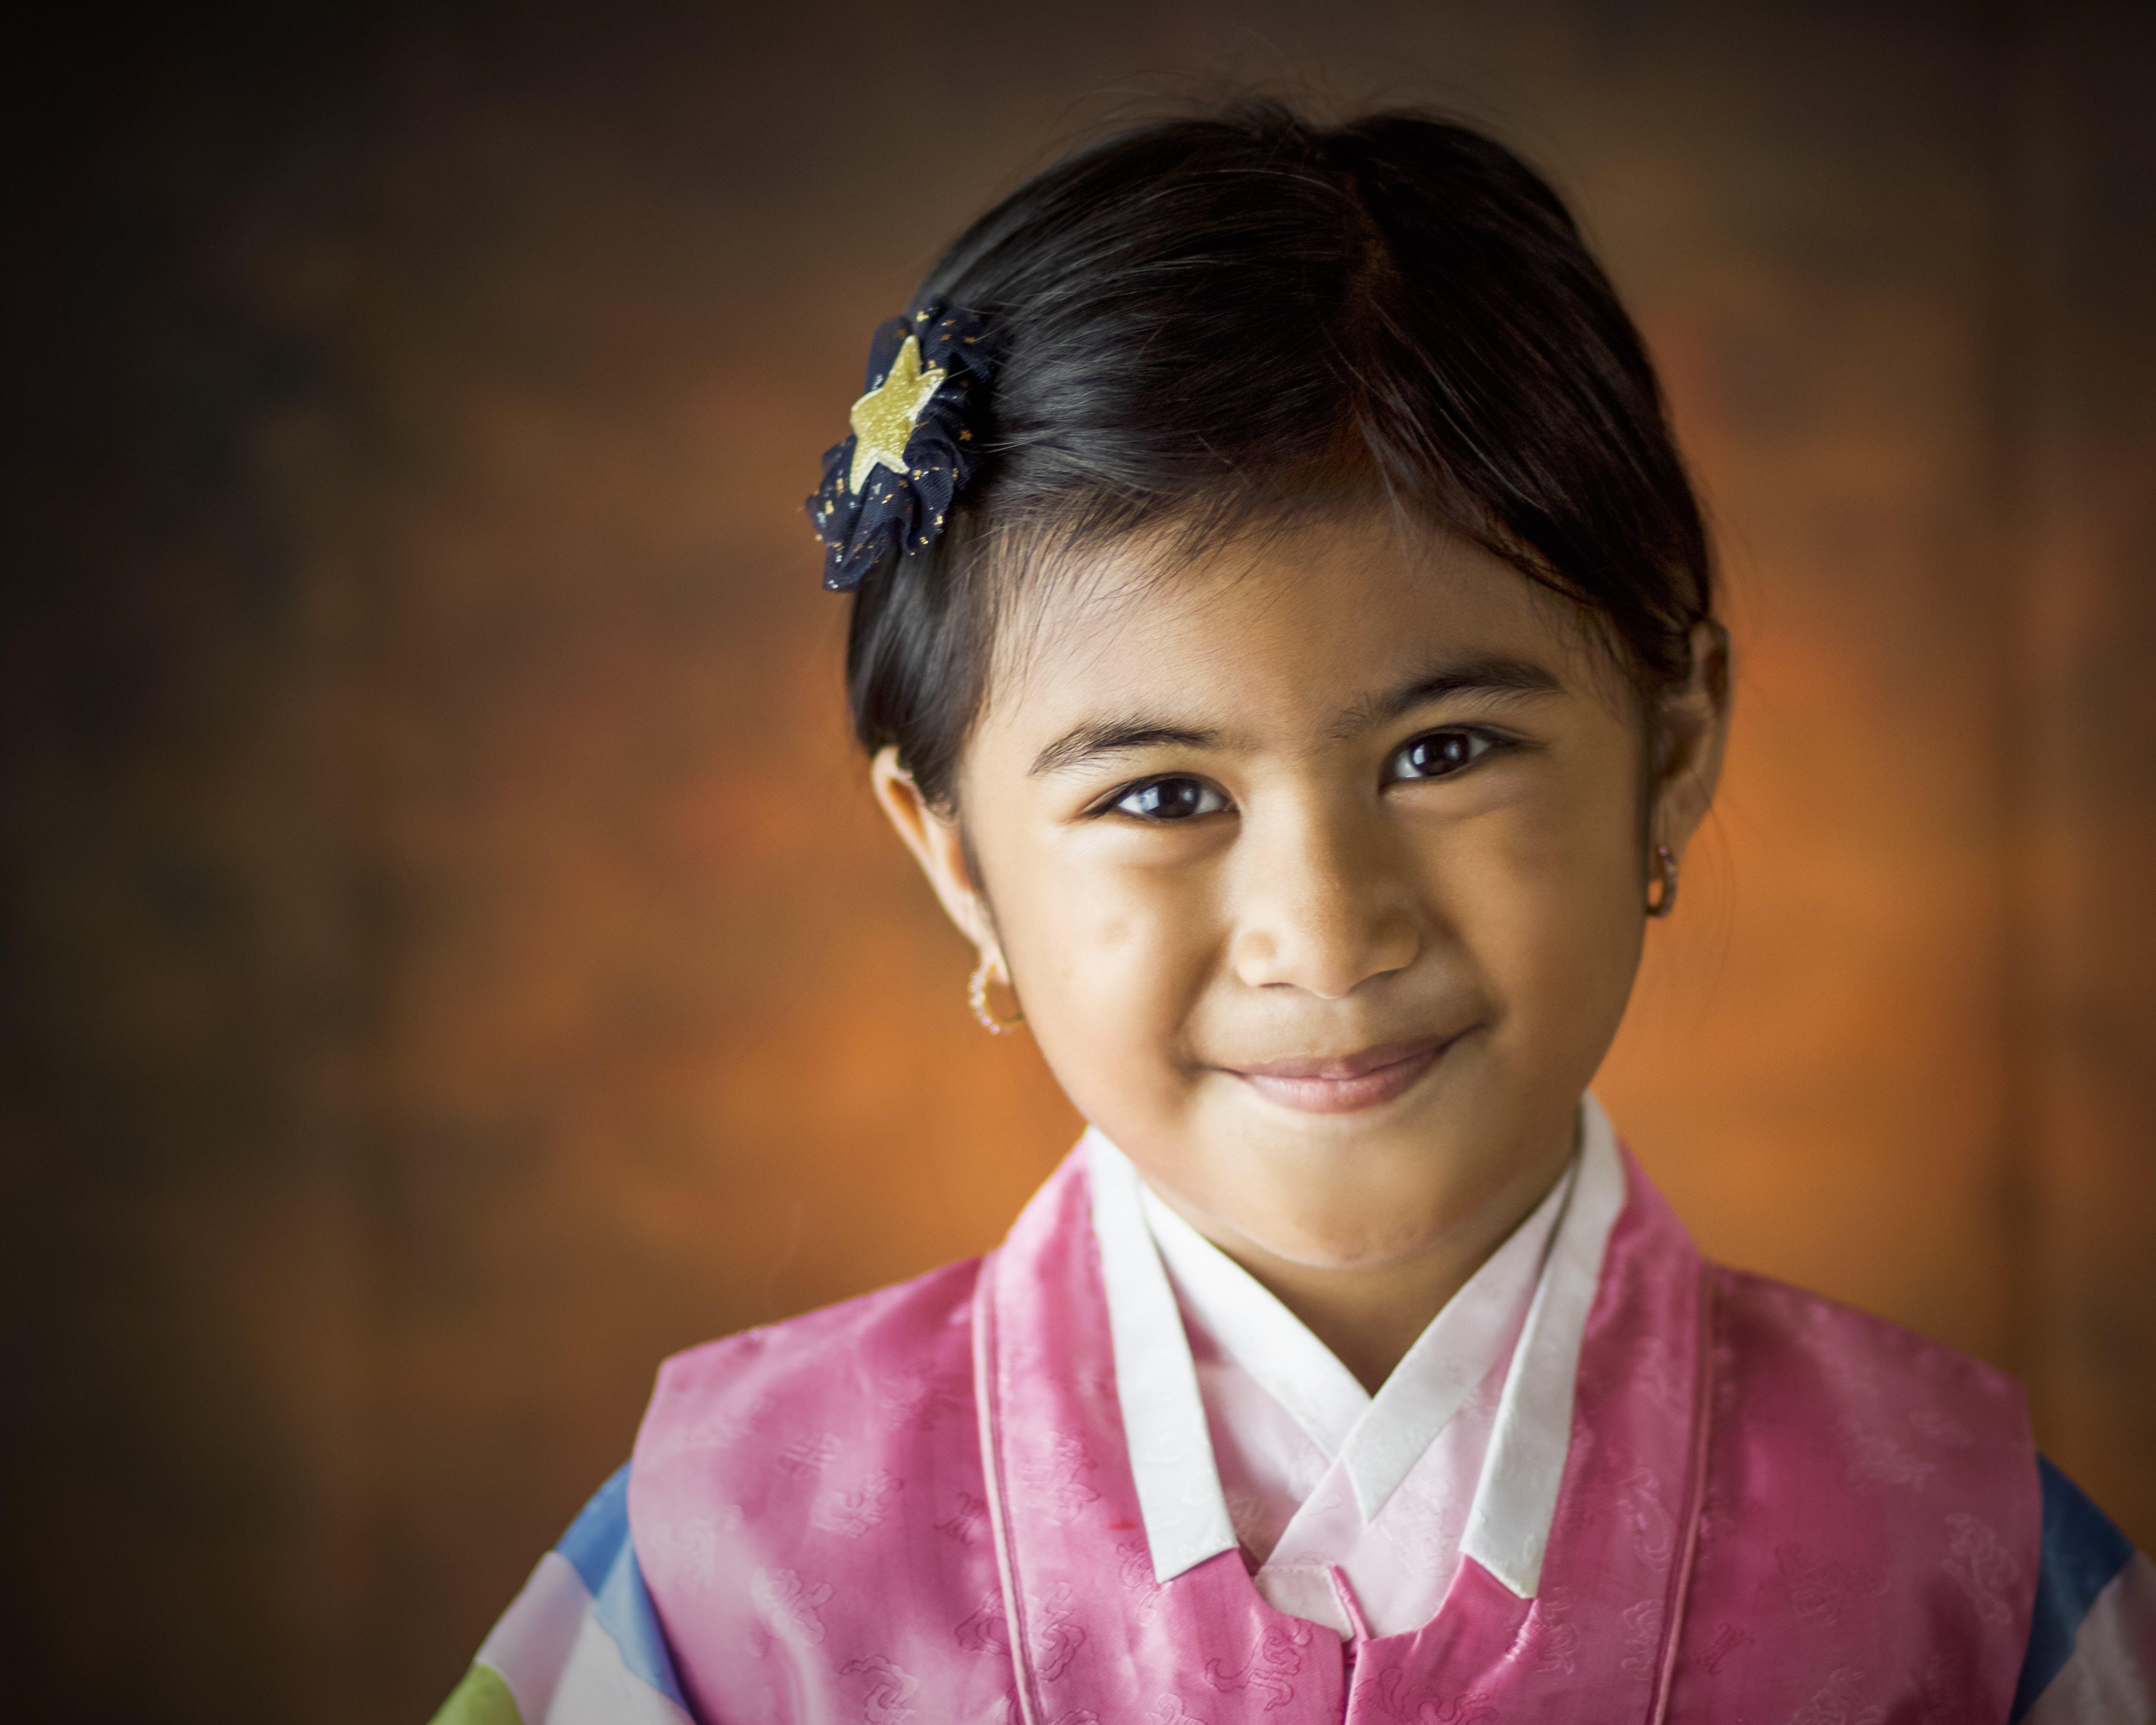 Girl Wearing Pink Hanbok Dress